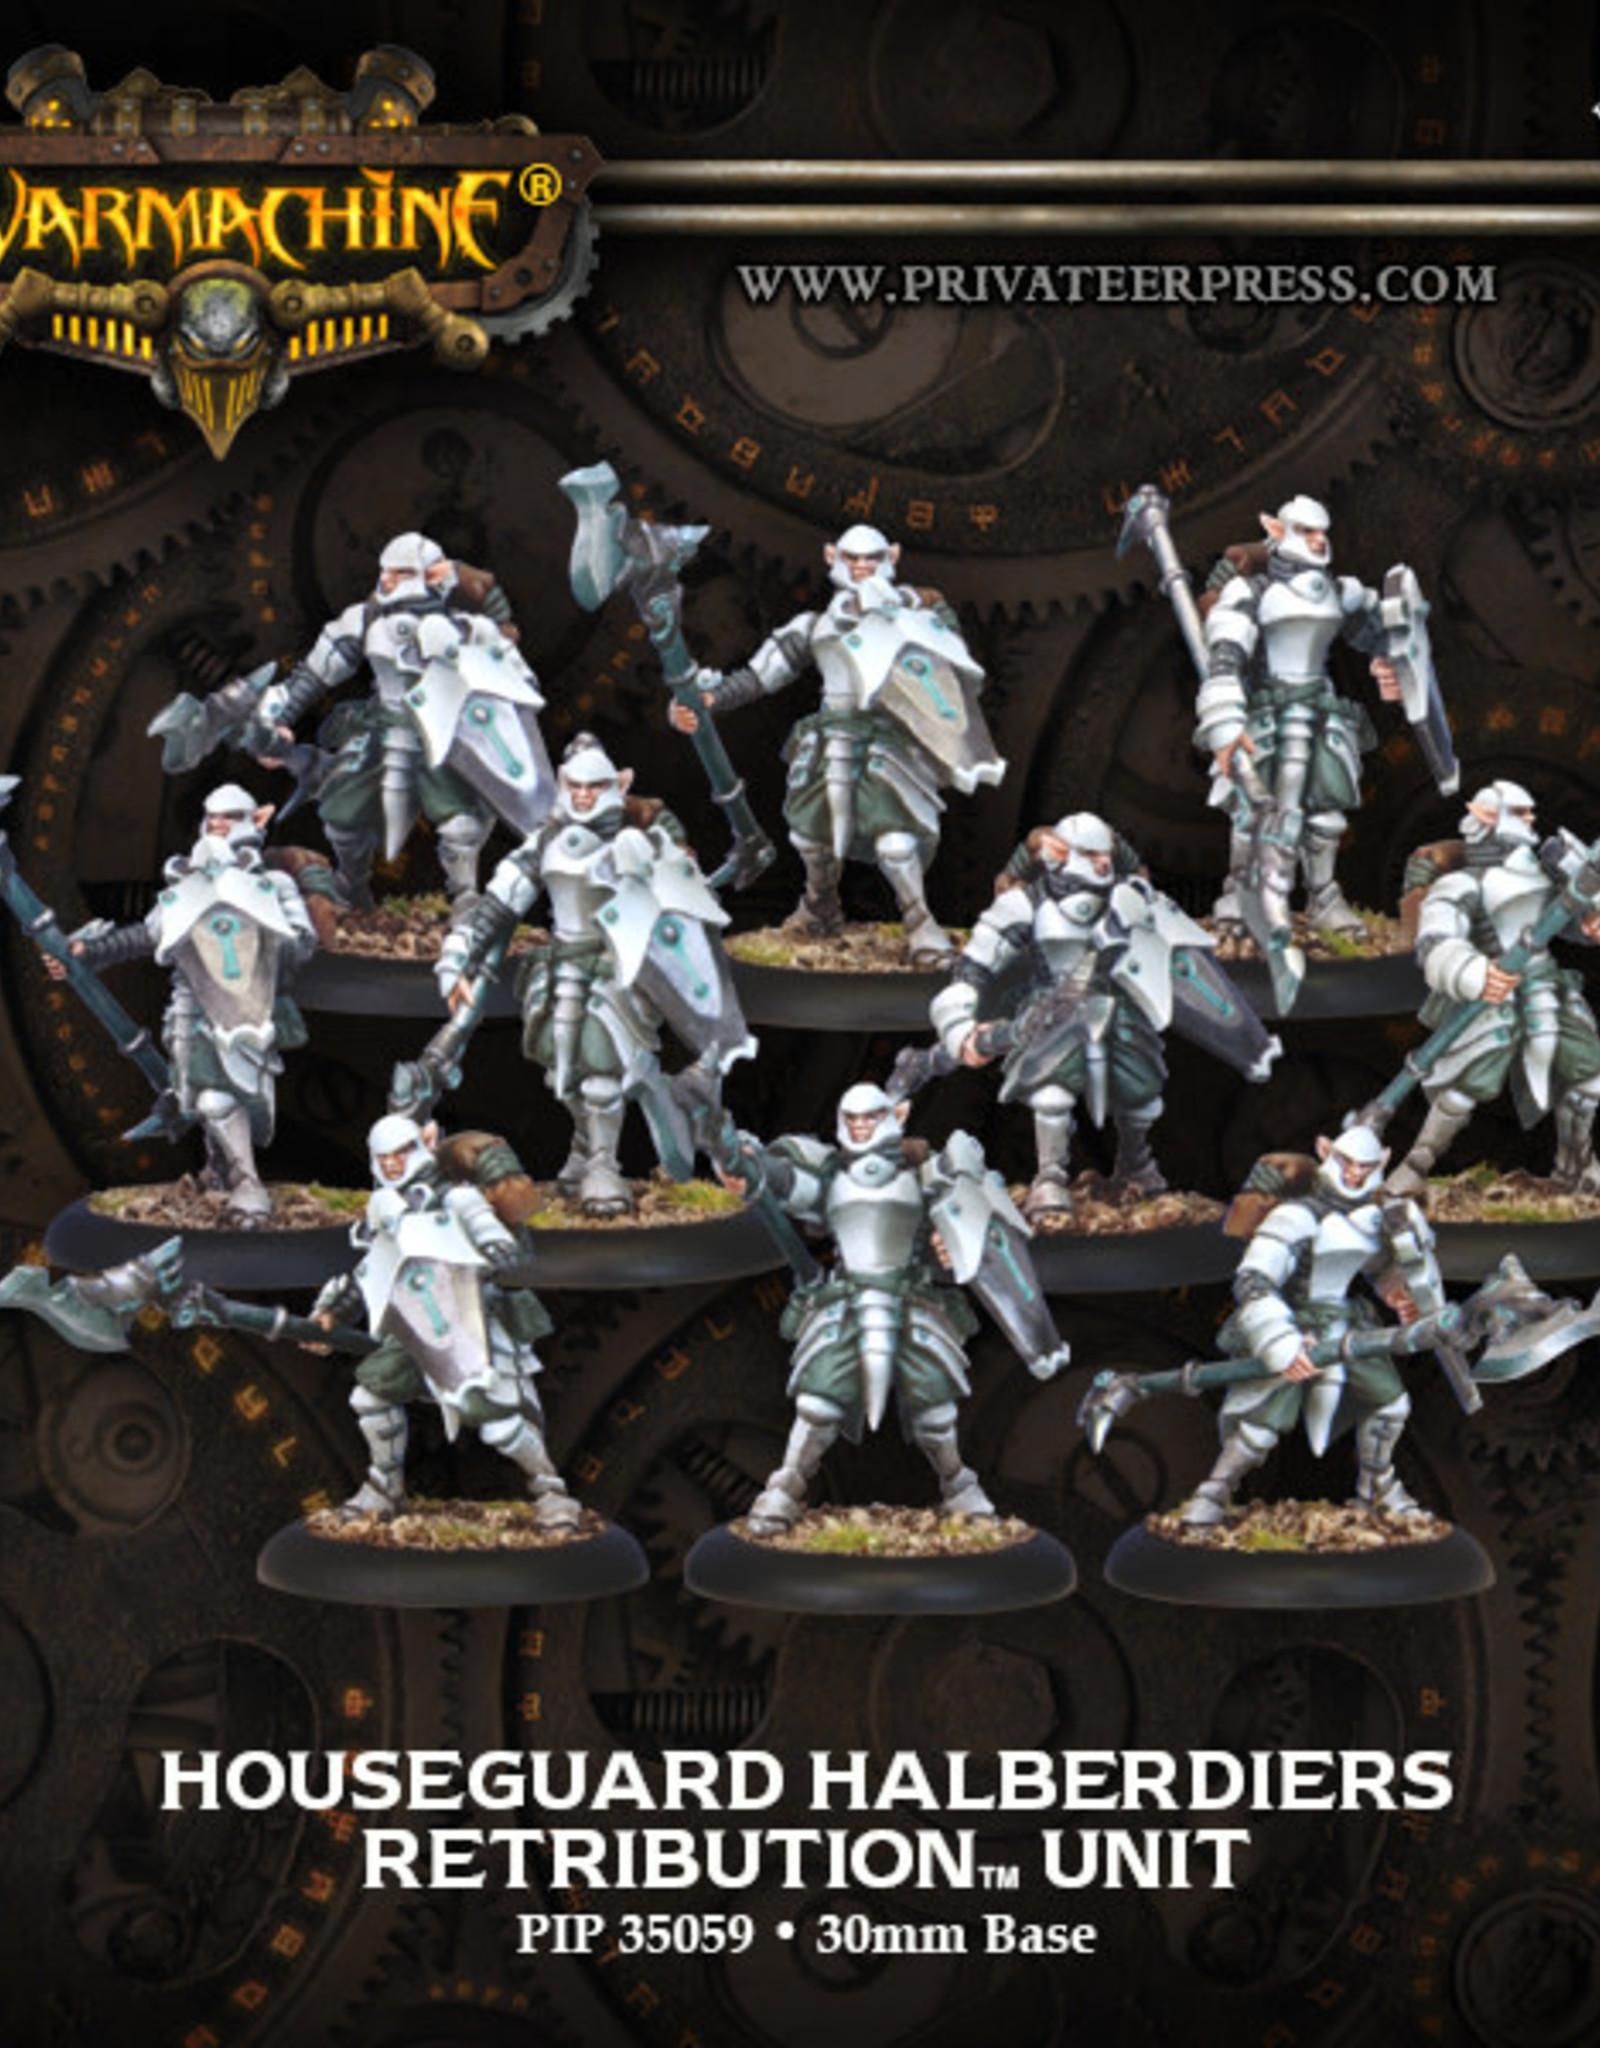 Warmachine Scyrah - Houseguard Halbediers